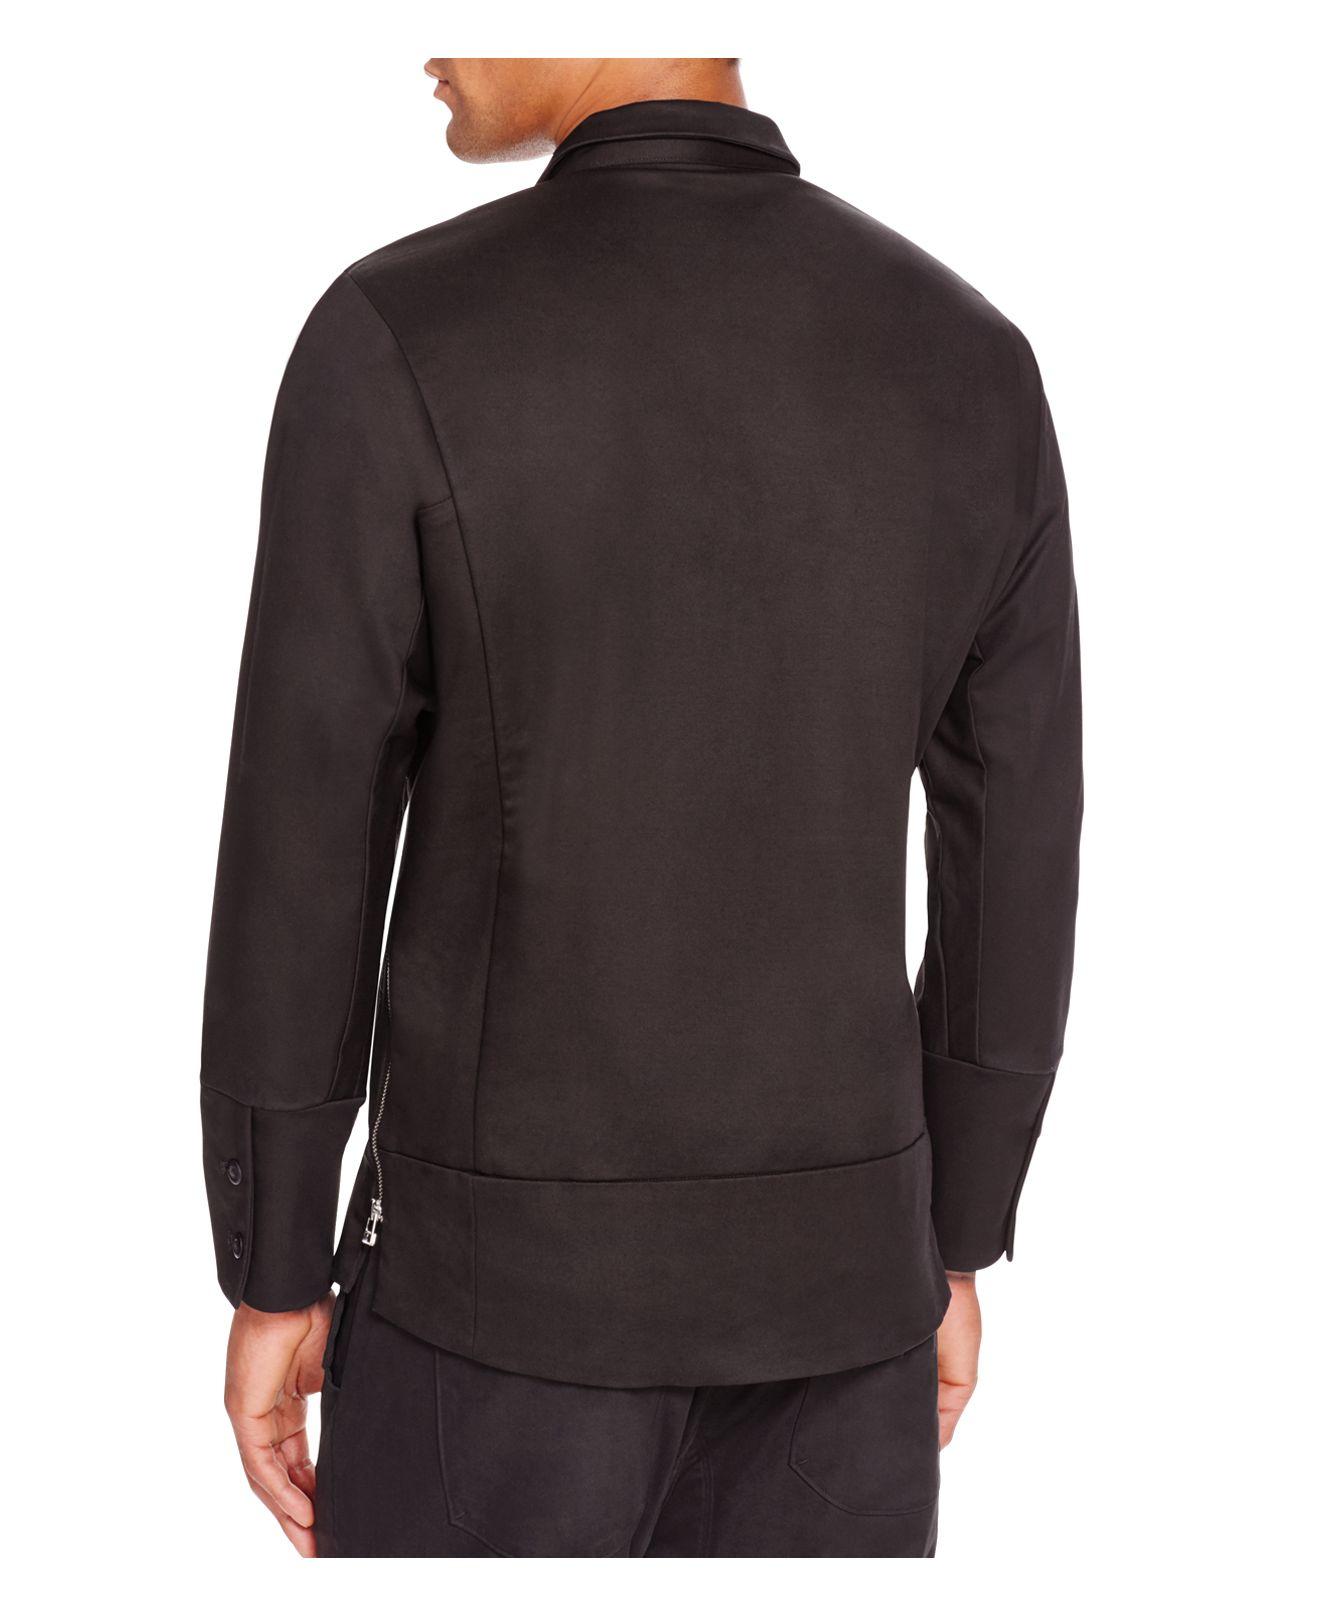 Chapter Despa Zip Jacket In Black For Men | Lyst